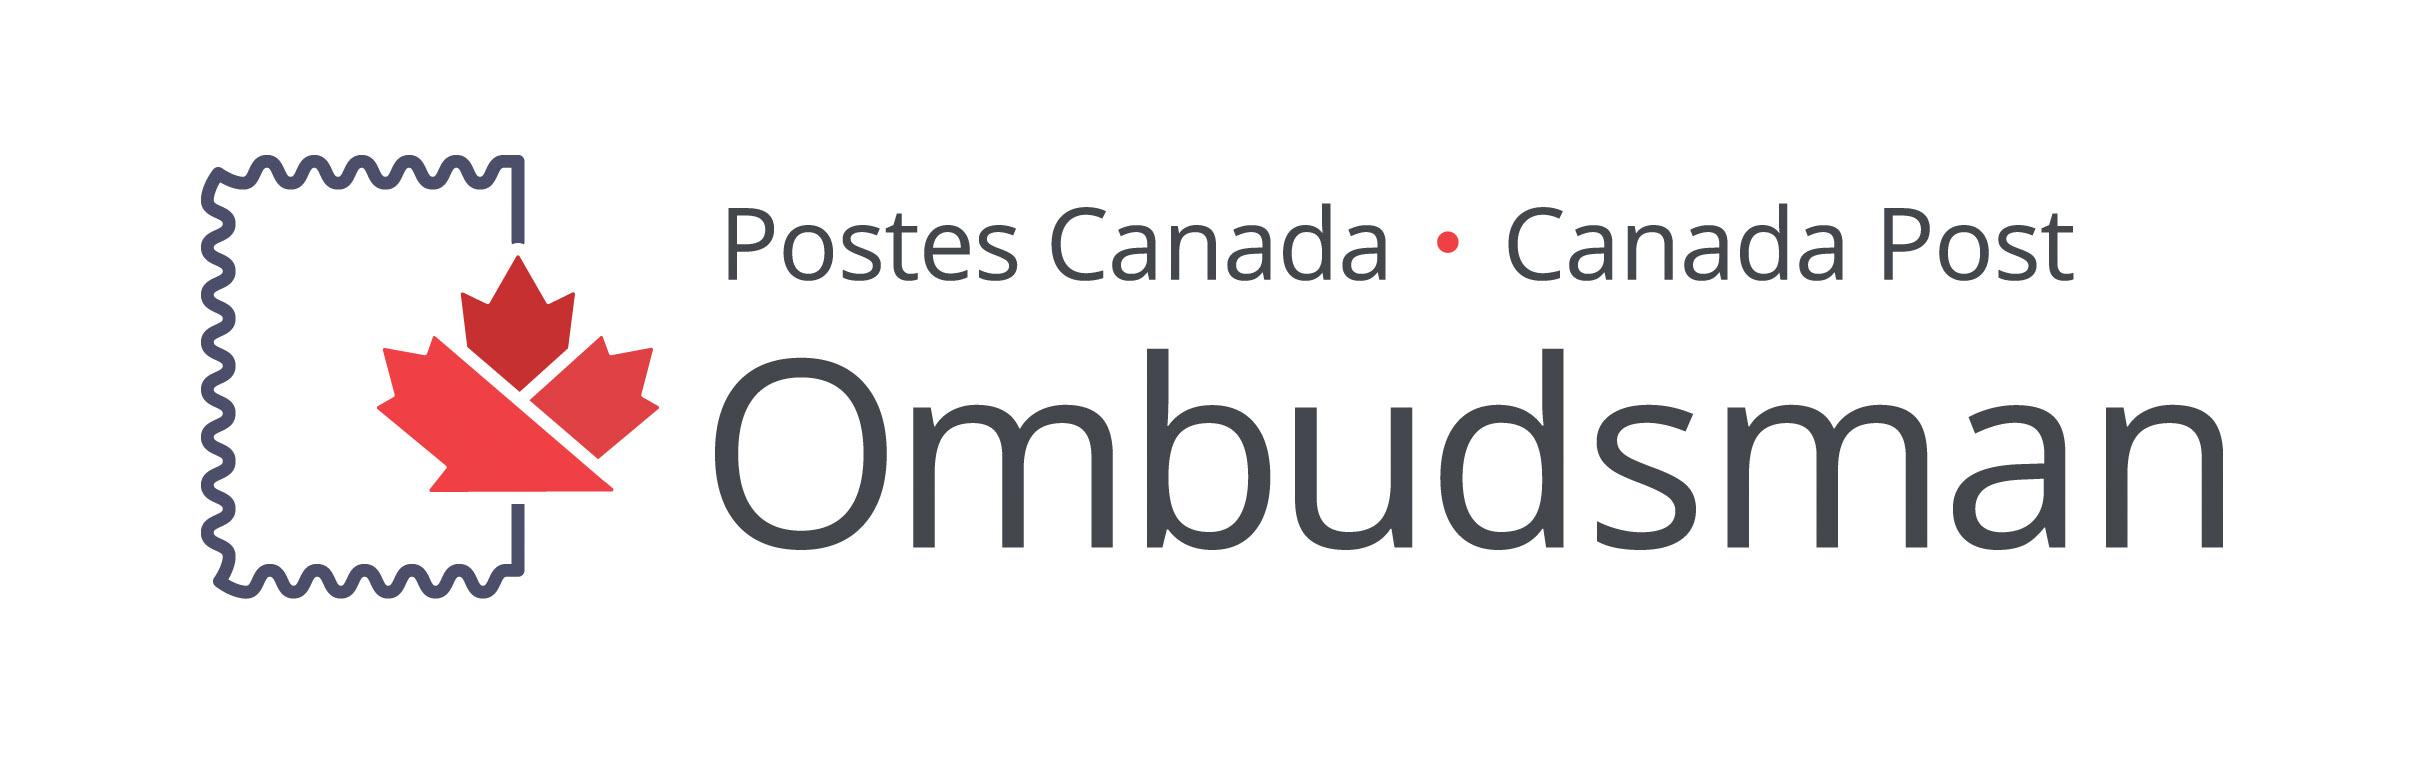 Ombudsman_logo_20180503